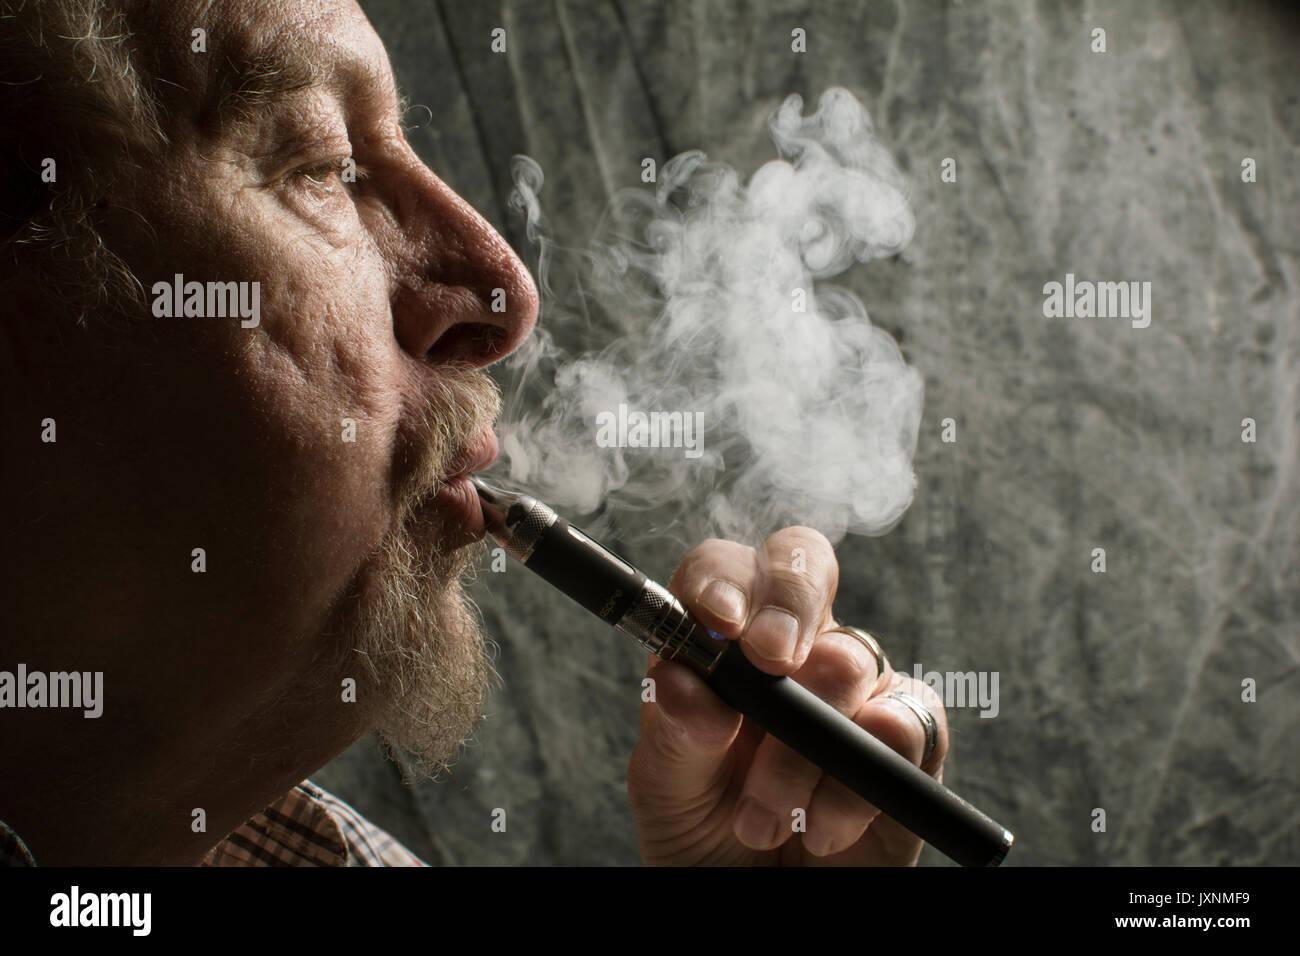 An older man with a beard smoking an electronic cigarette ( vaping an E-cigarette), a healthier option than tobacco - Stock Image